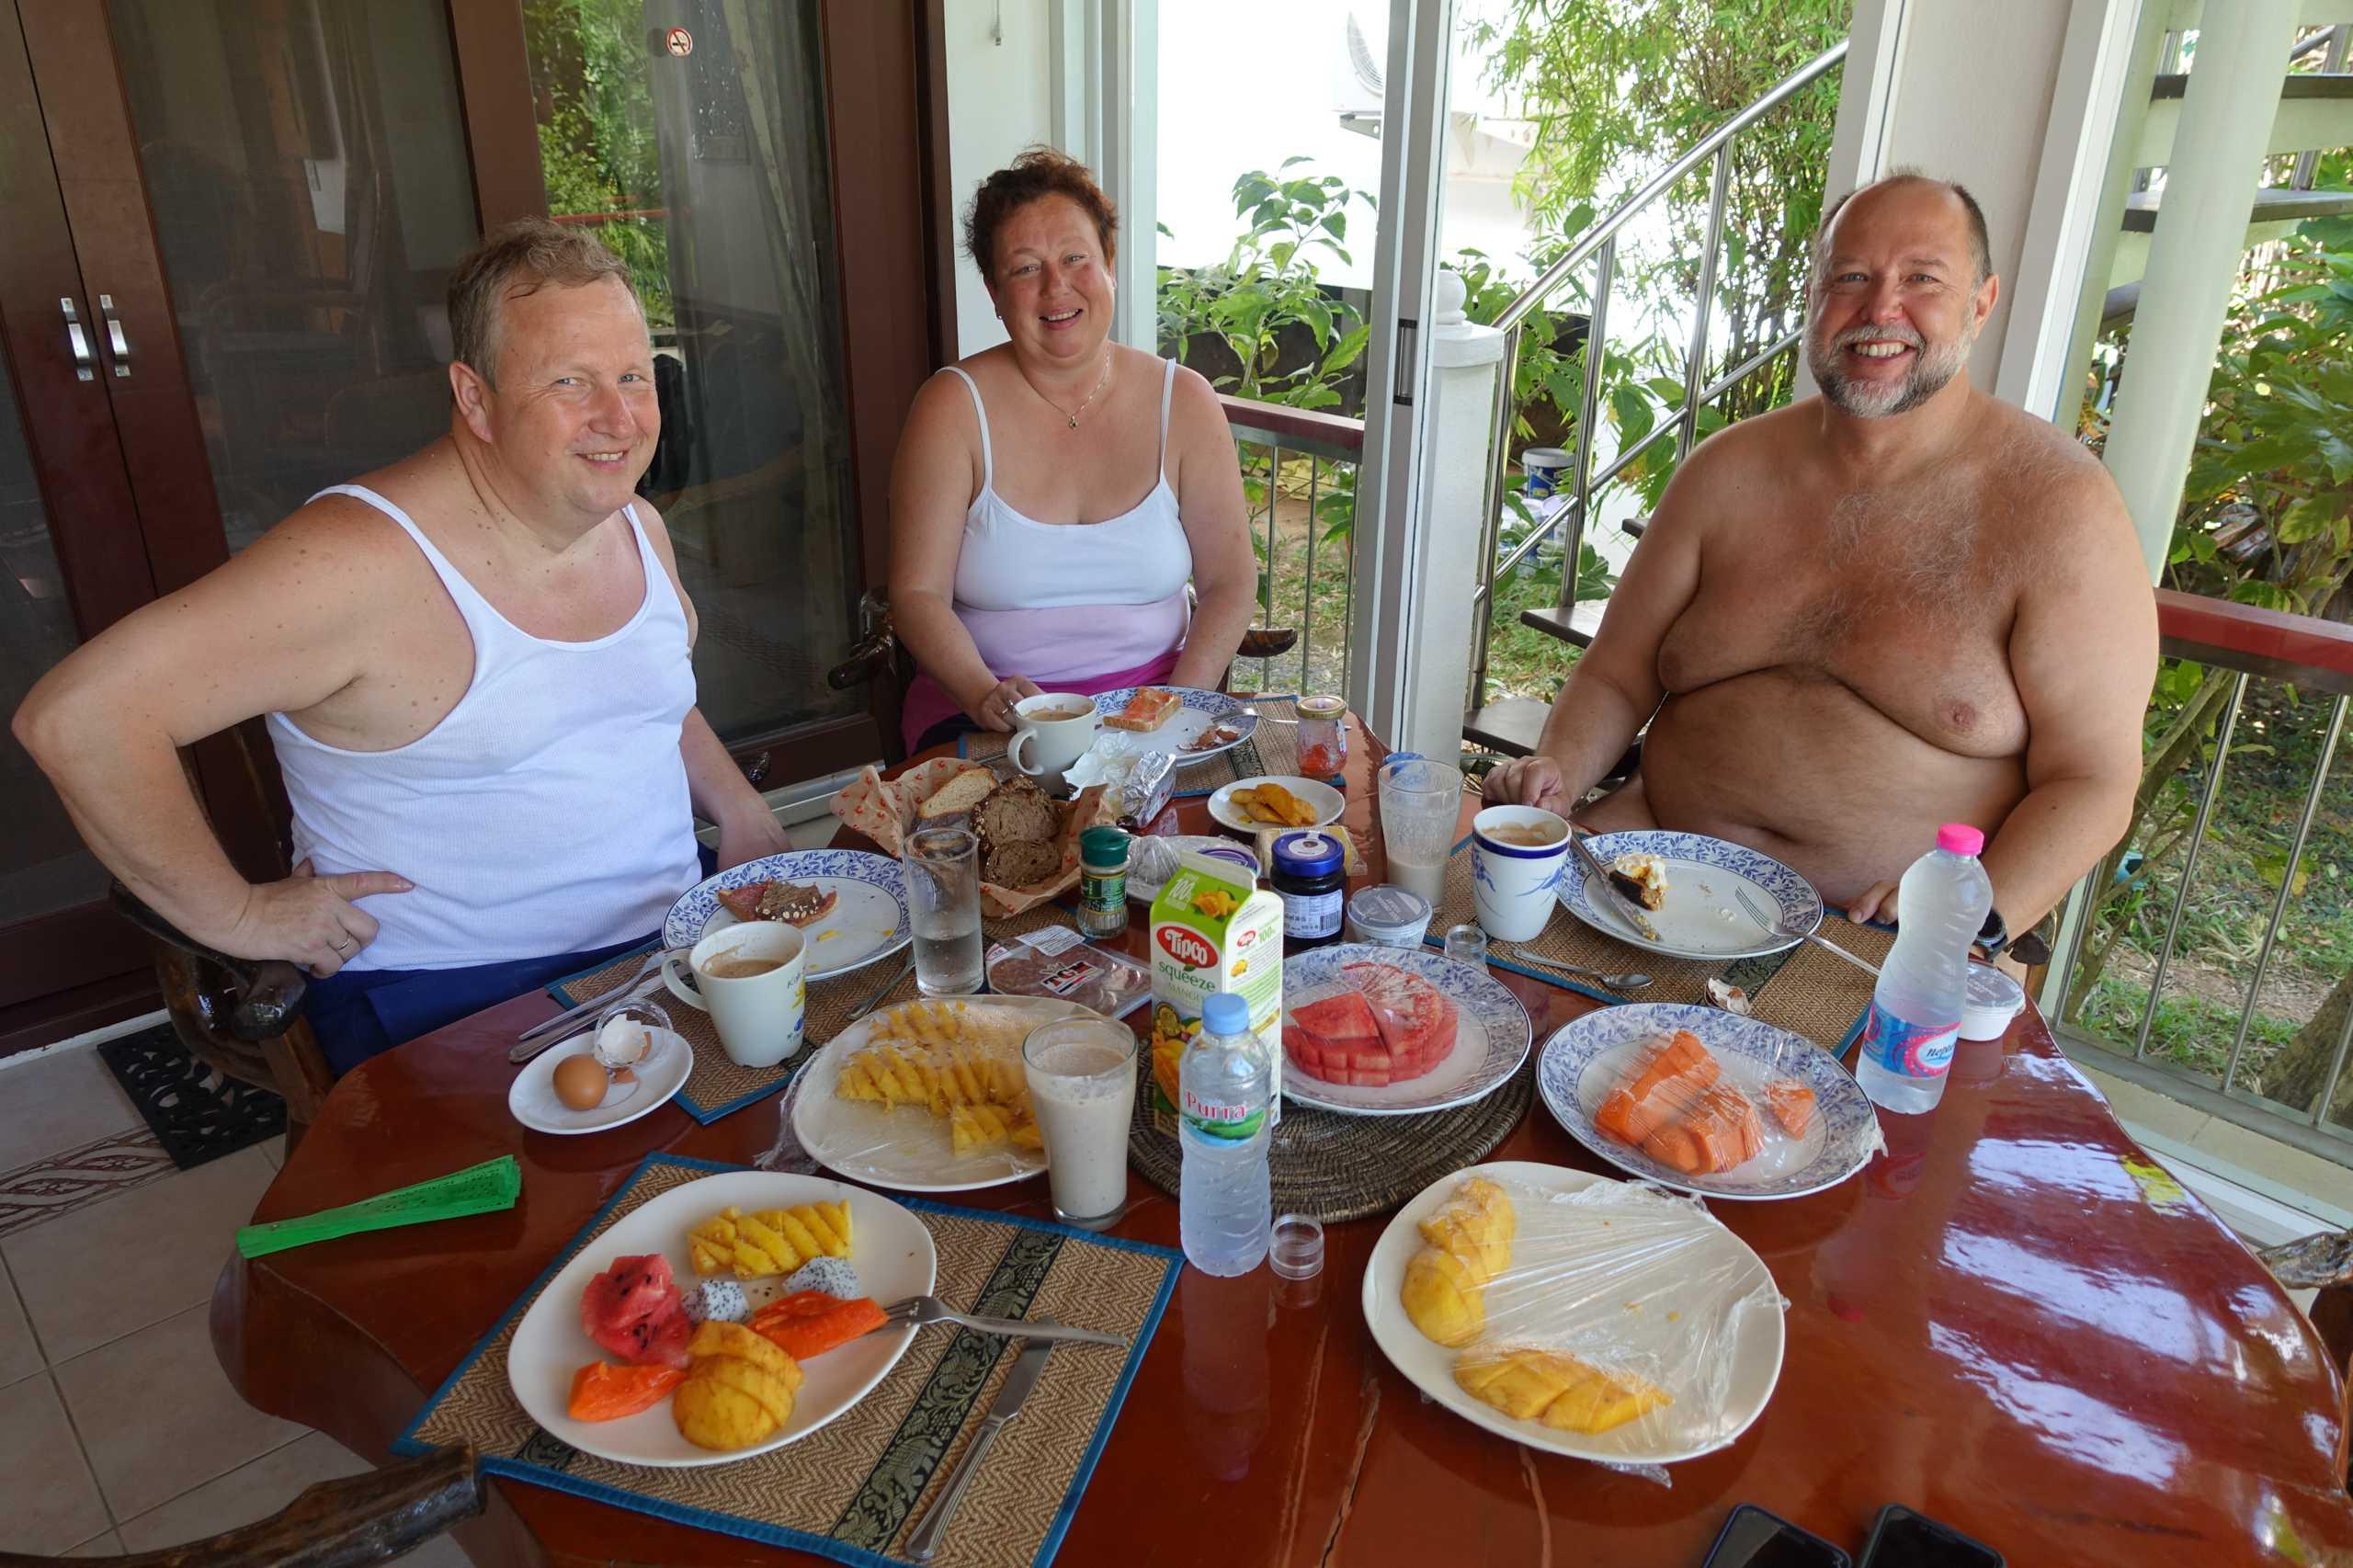 Leckeres, gesundes Frühstück